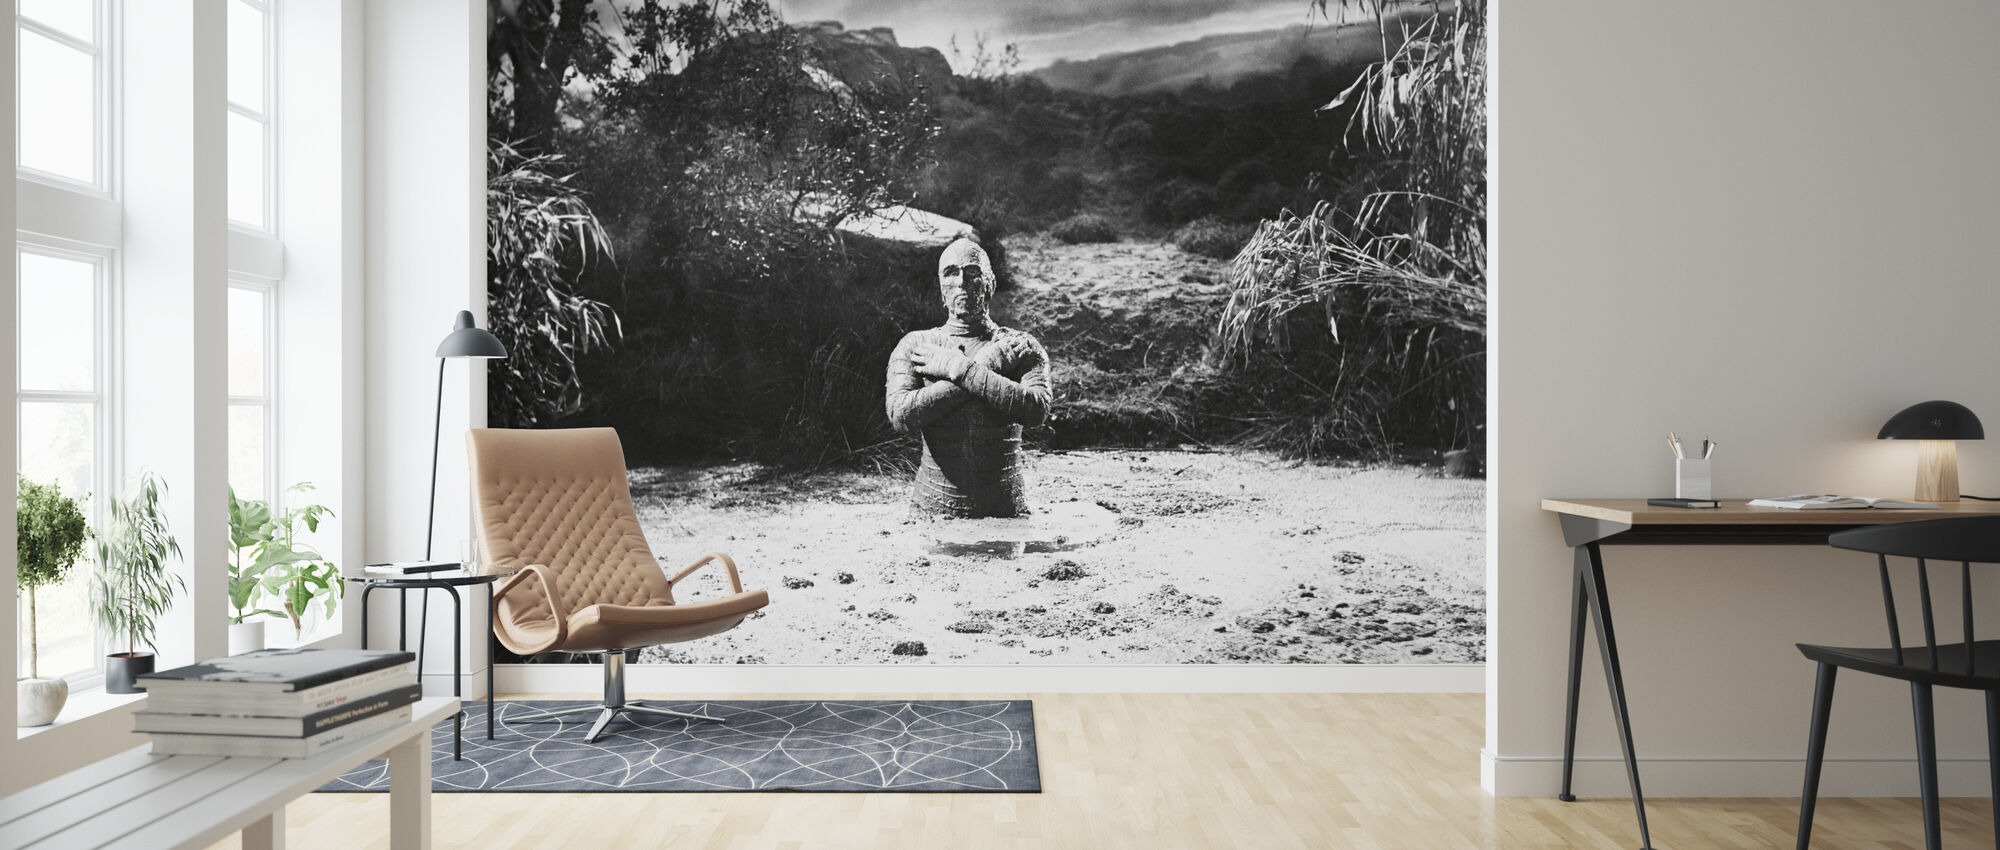 Mummy - Christopher Lee - Wallpaper - Living Room